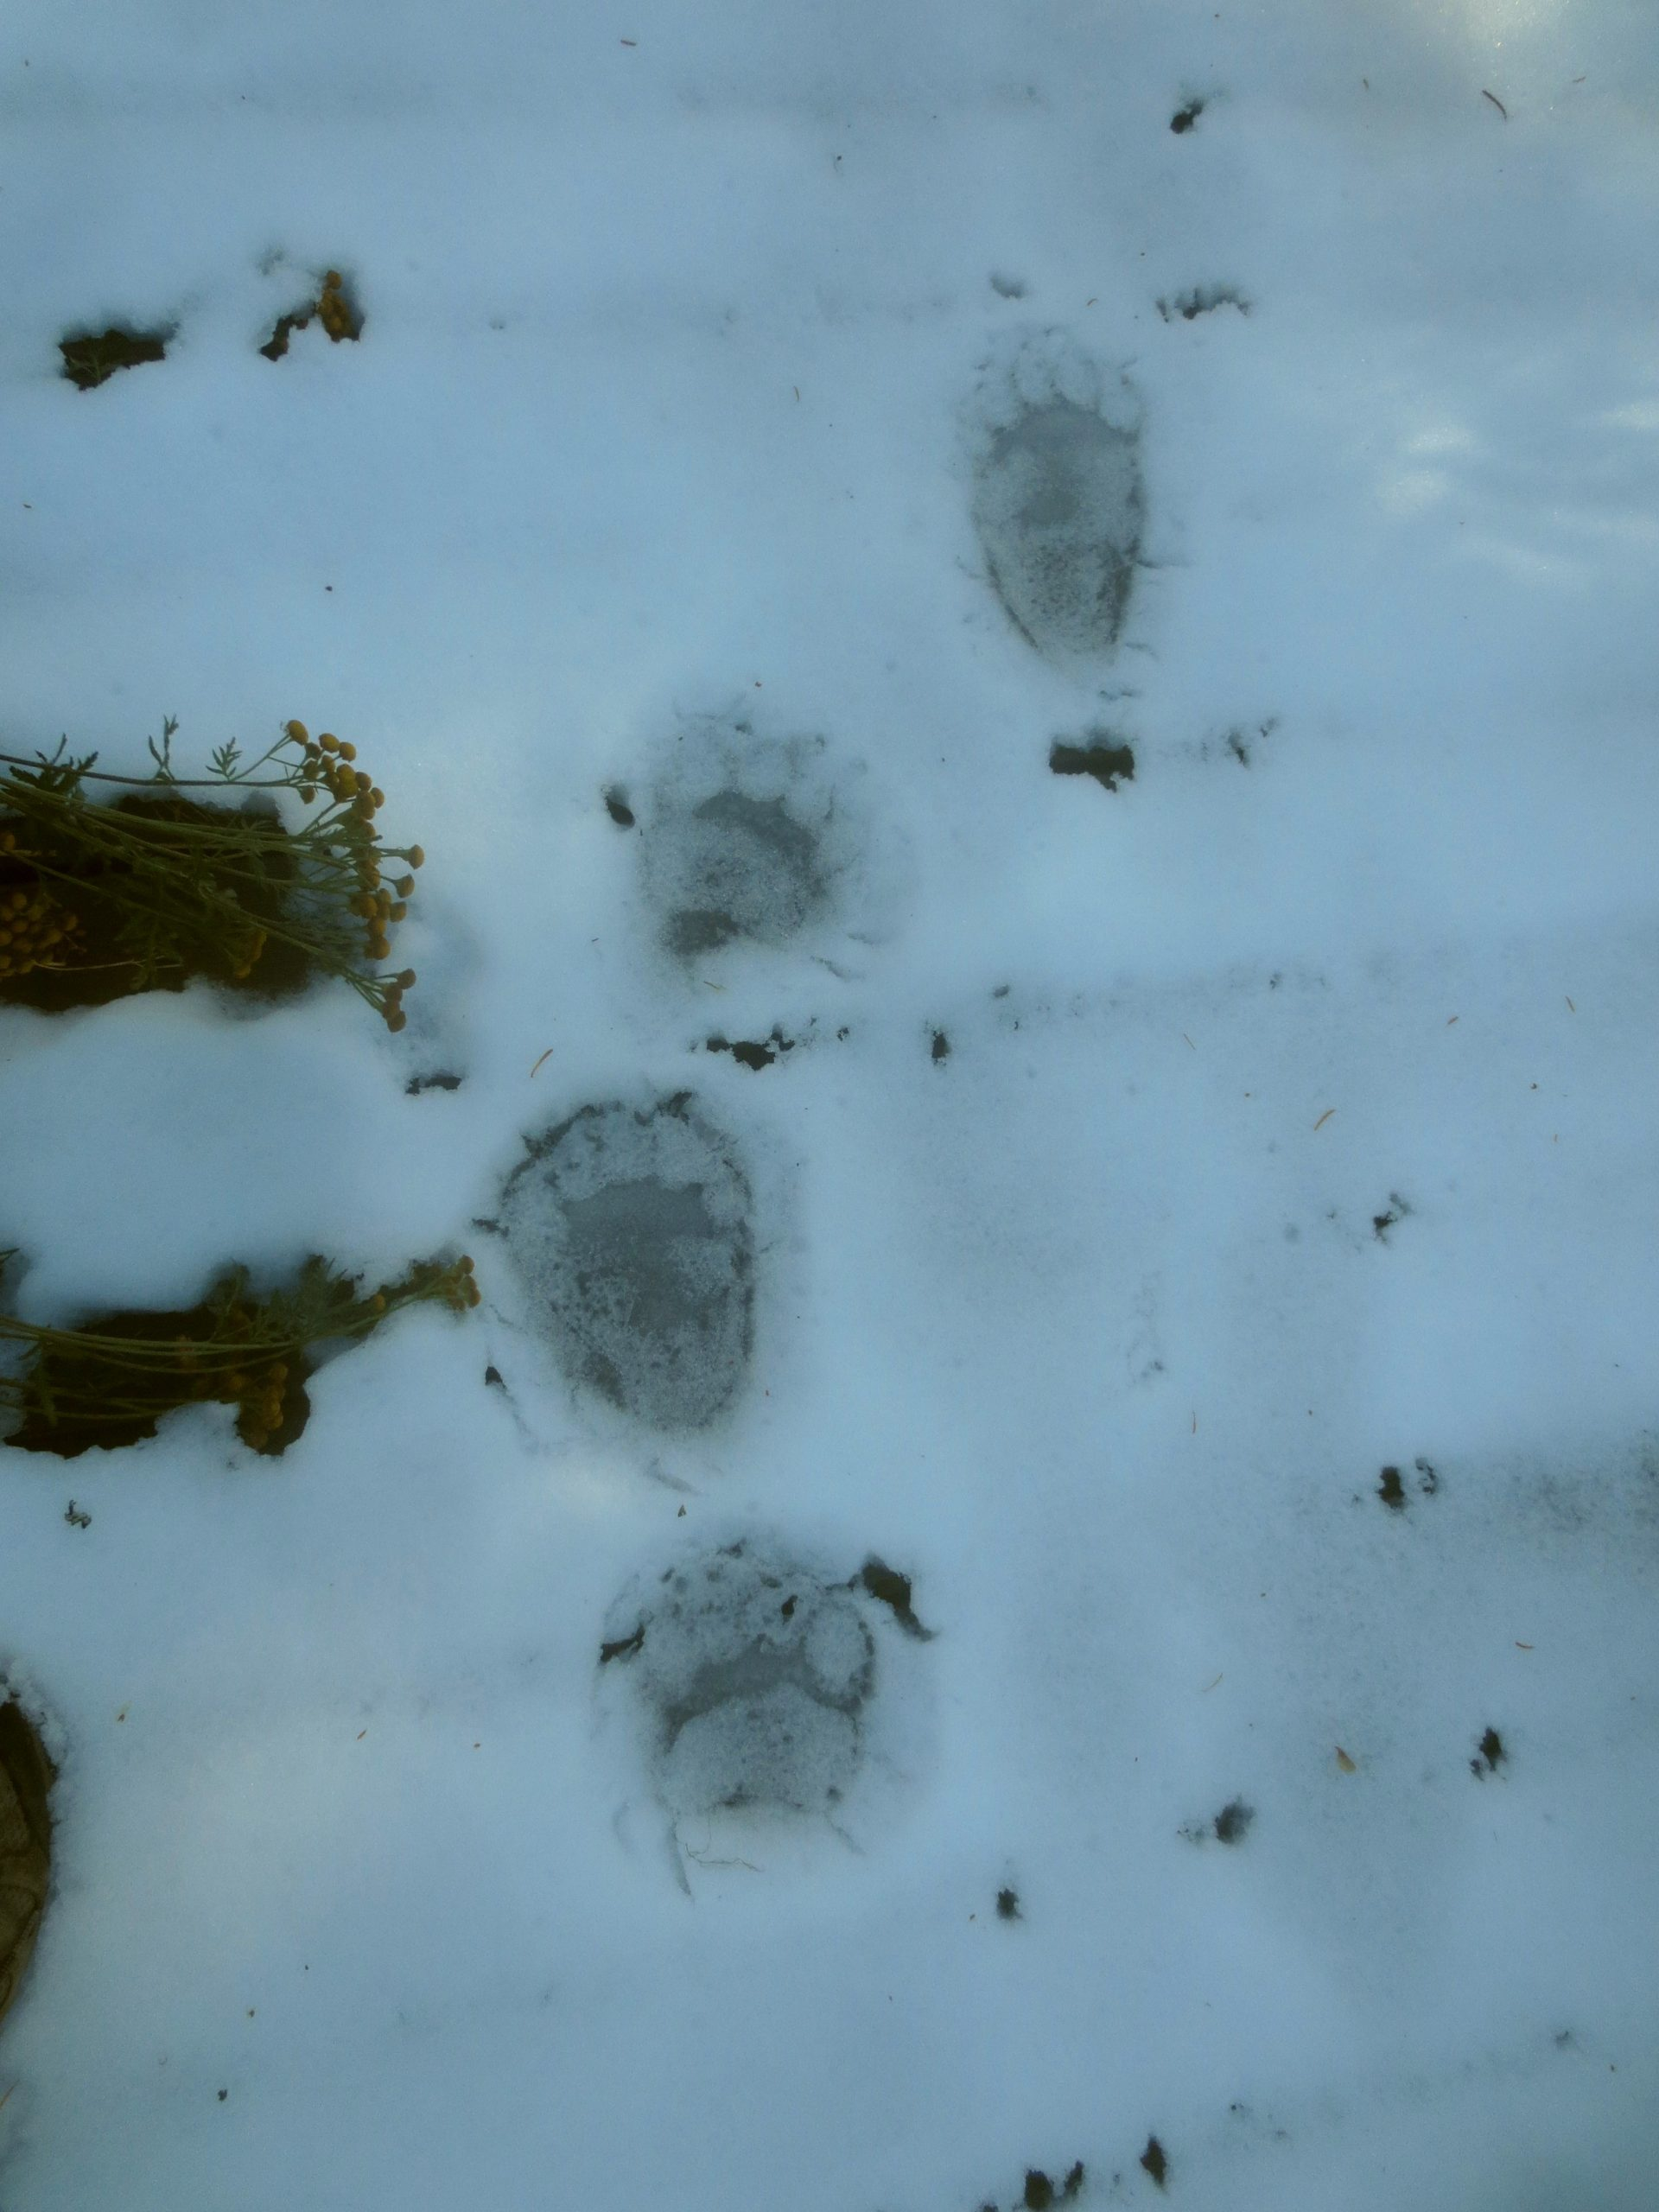 bear tracks in snow